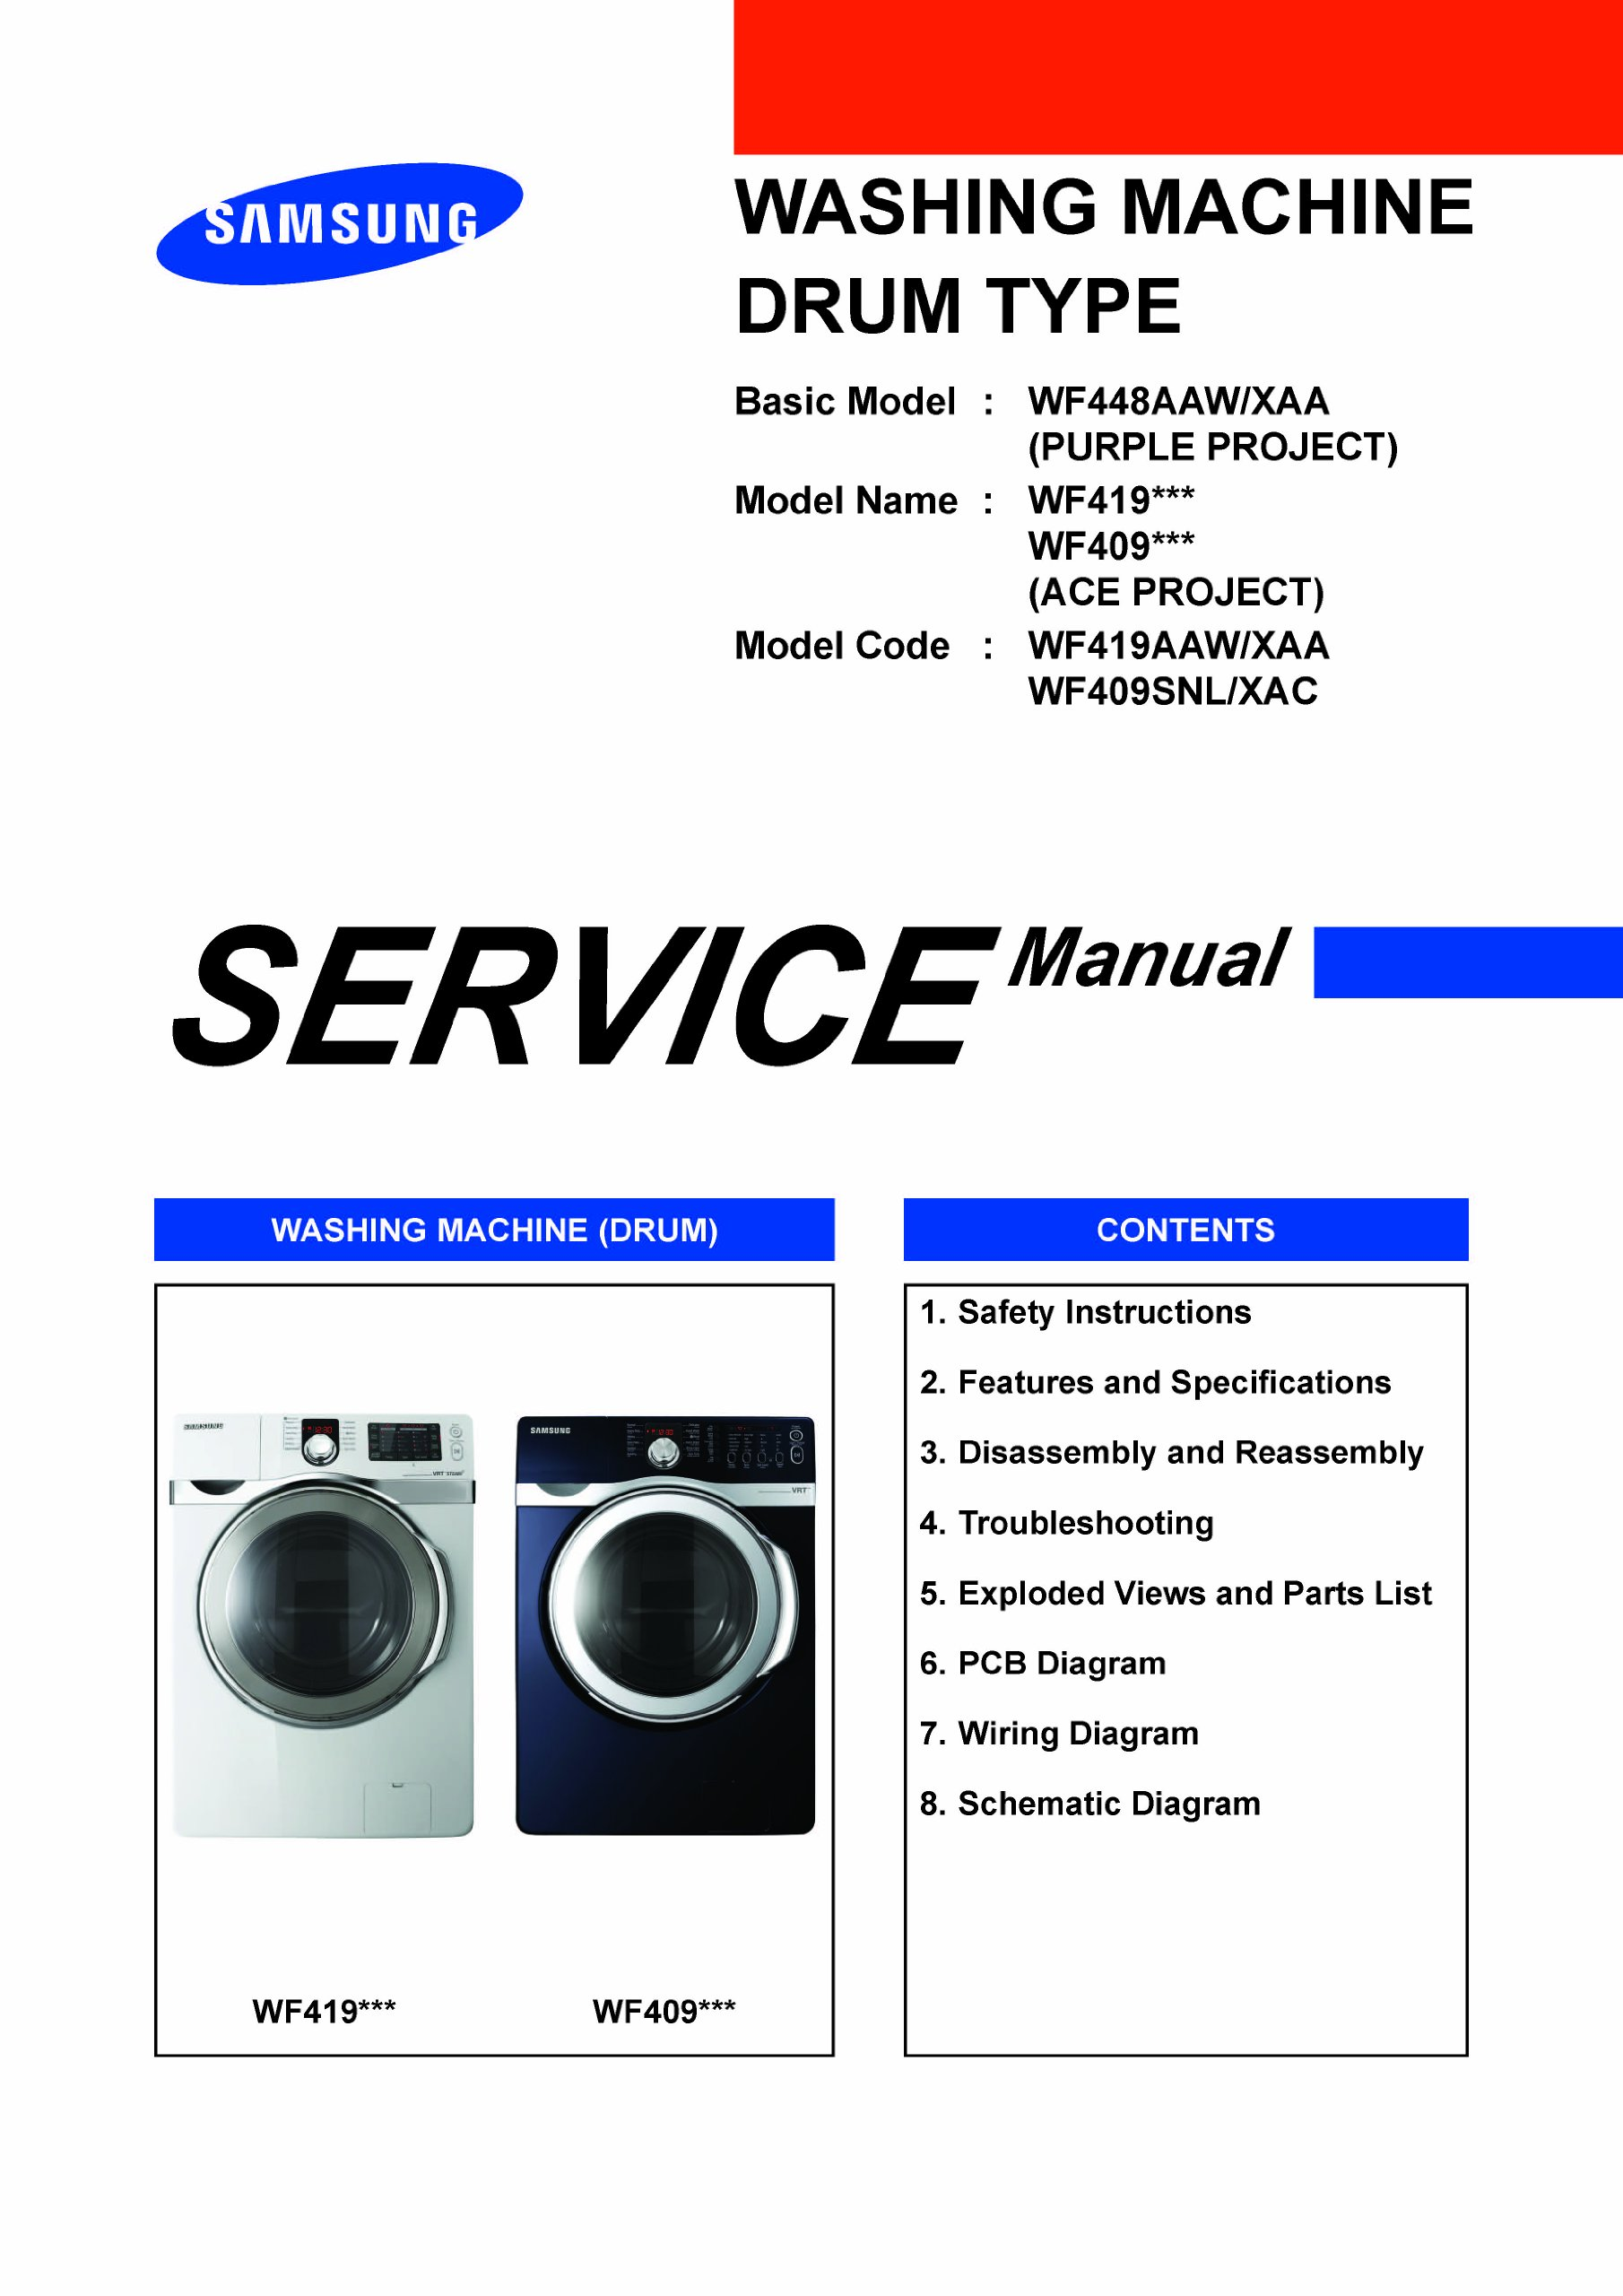 Dryer Wiring Diagram Samsung Service Manual - Wiring